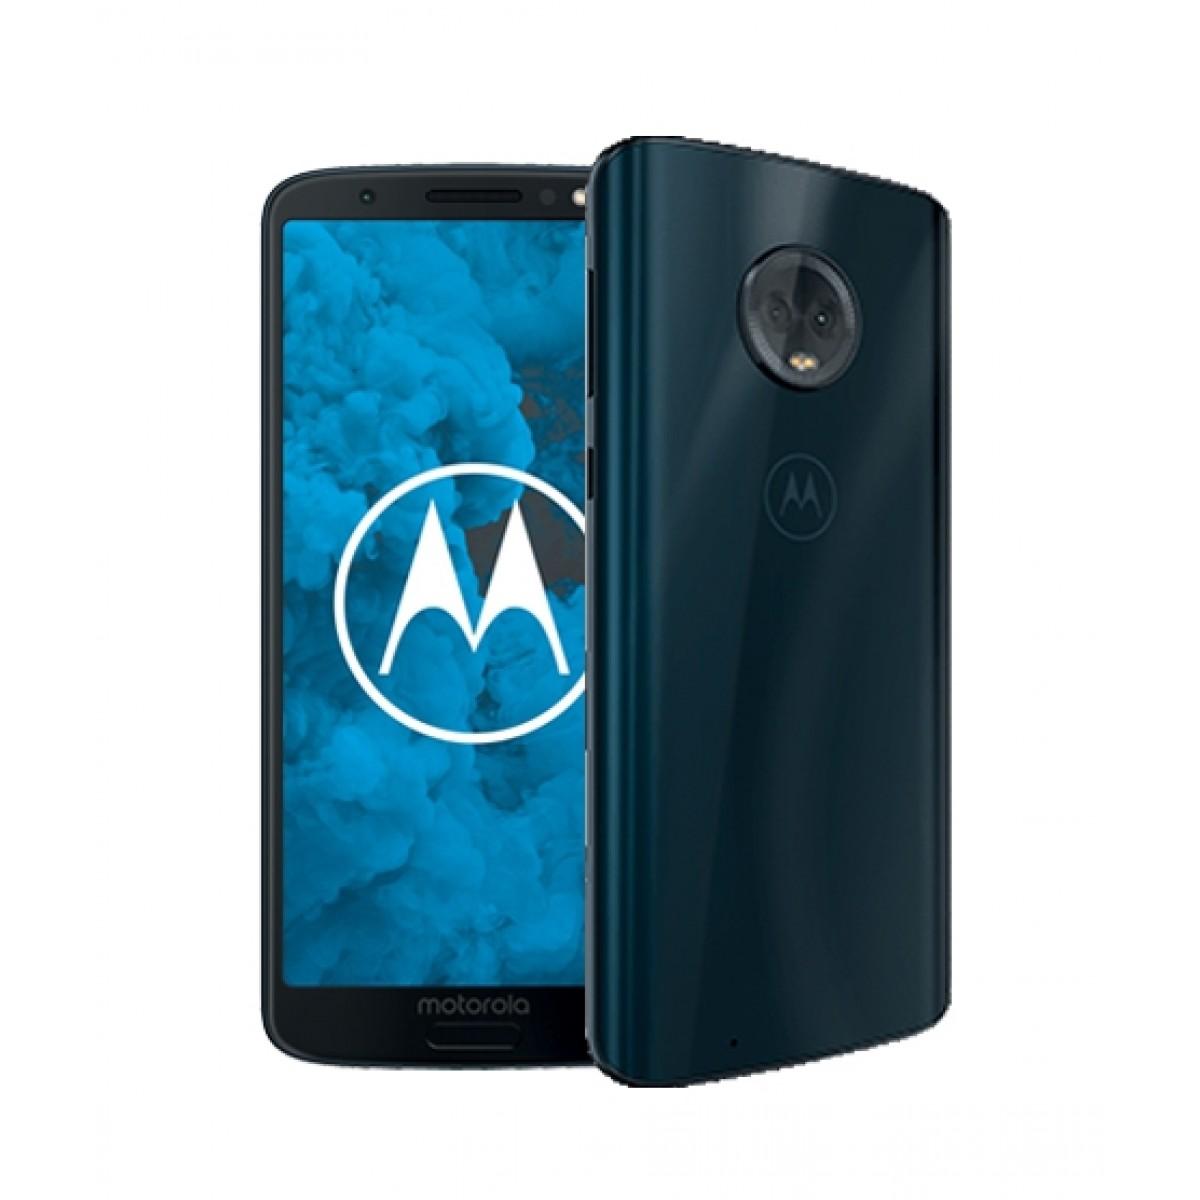 fd1725cbc Motorola Moto G6 Price in Pakistan